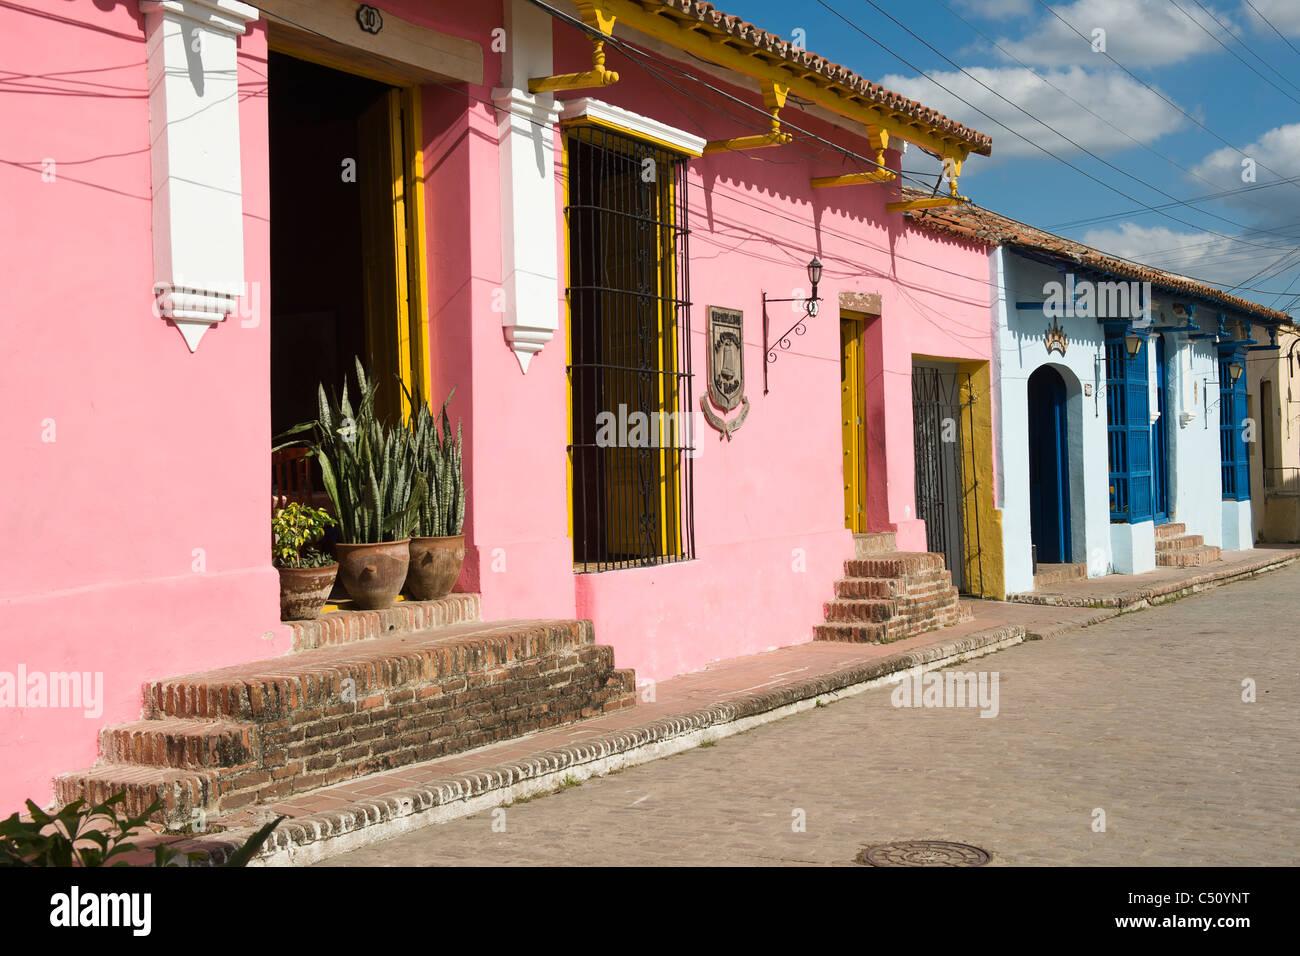 Colorful facade of colonial houses, Camaguey, Cuba Stock Photo ...